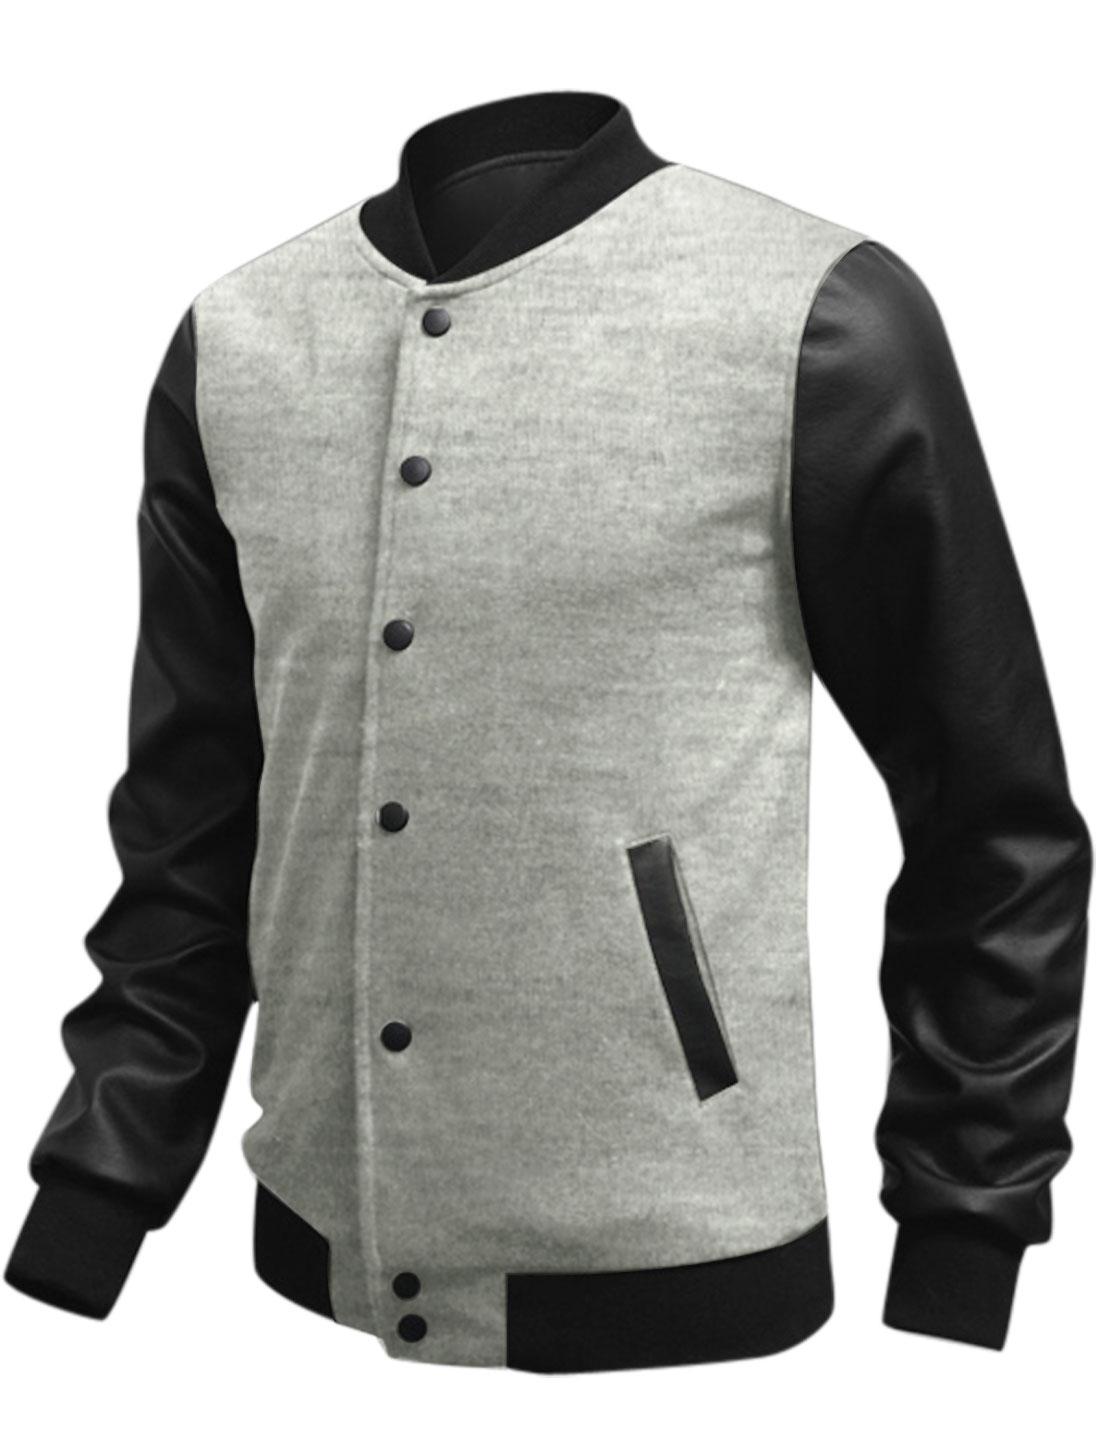 Man Rib Knit Collar Cuffs Button Closure Slant Pockets Jacket Light Gray M